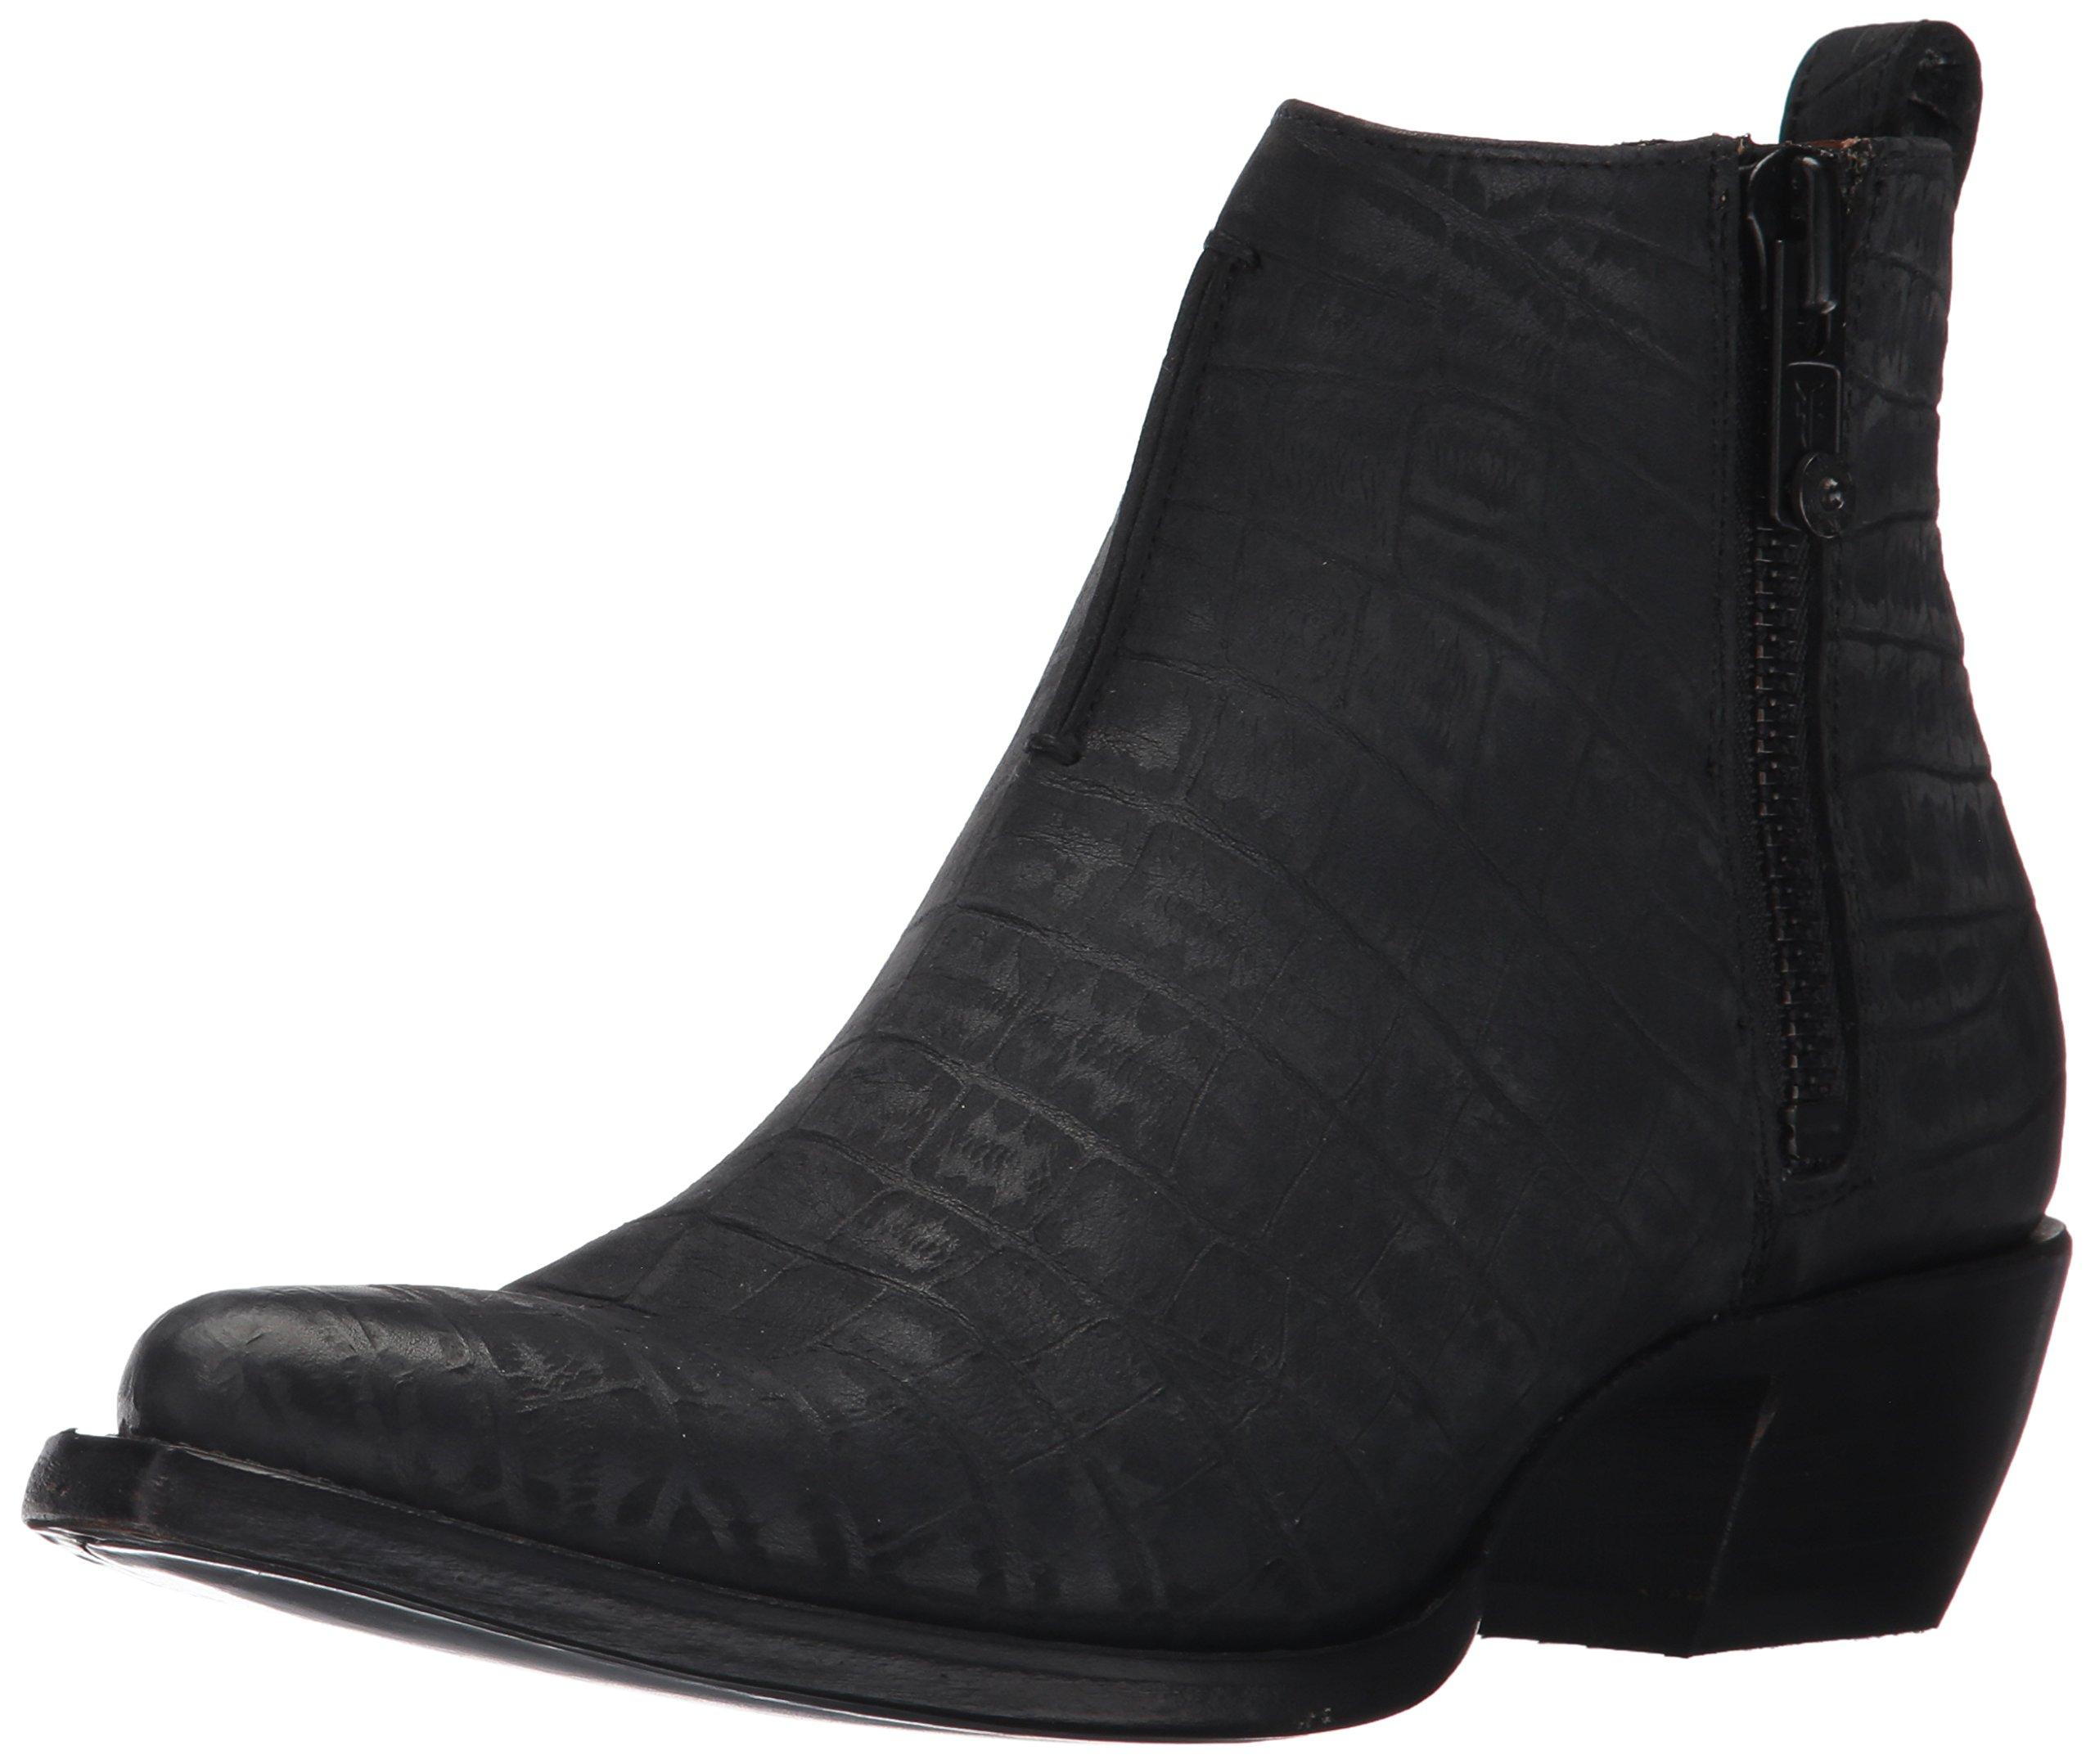 FRYE Women's Sacha Moto Shortie Boot, Black Crocodile Embossed, 6 M US